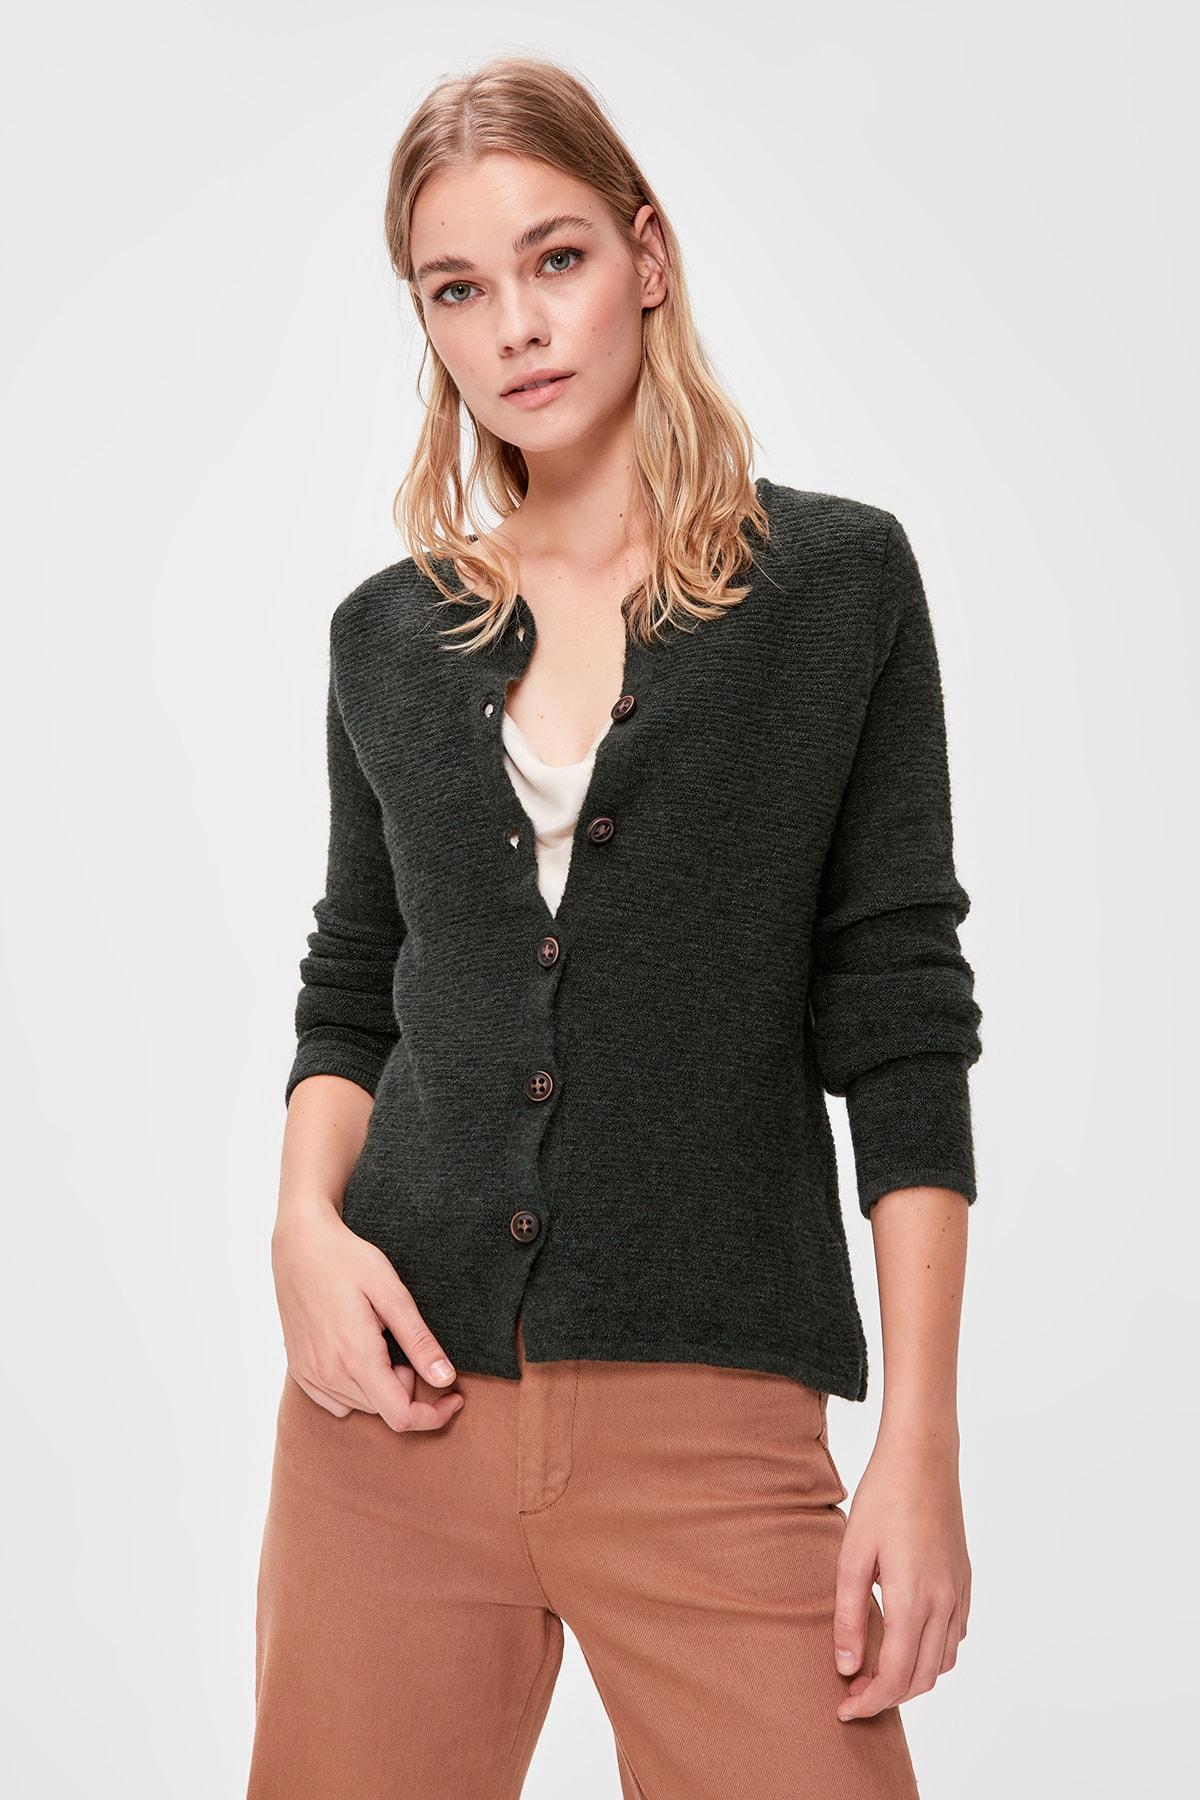 Trendyol Button Sweater Cardigan TWOAW20HI0177